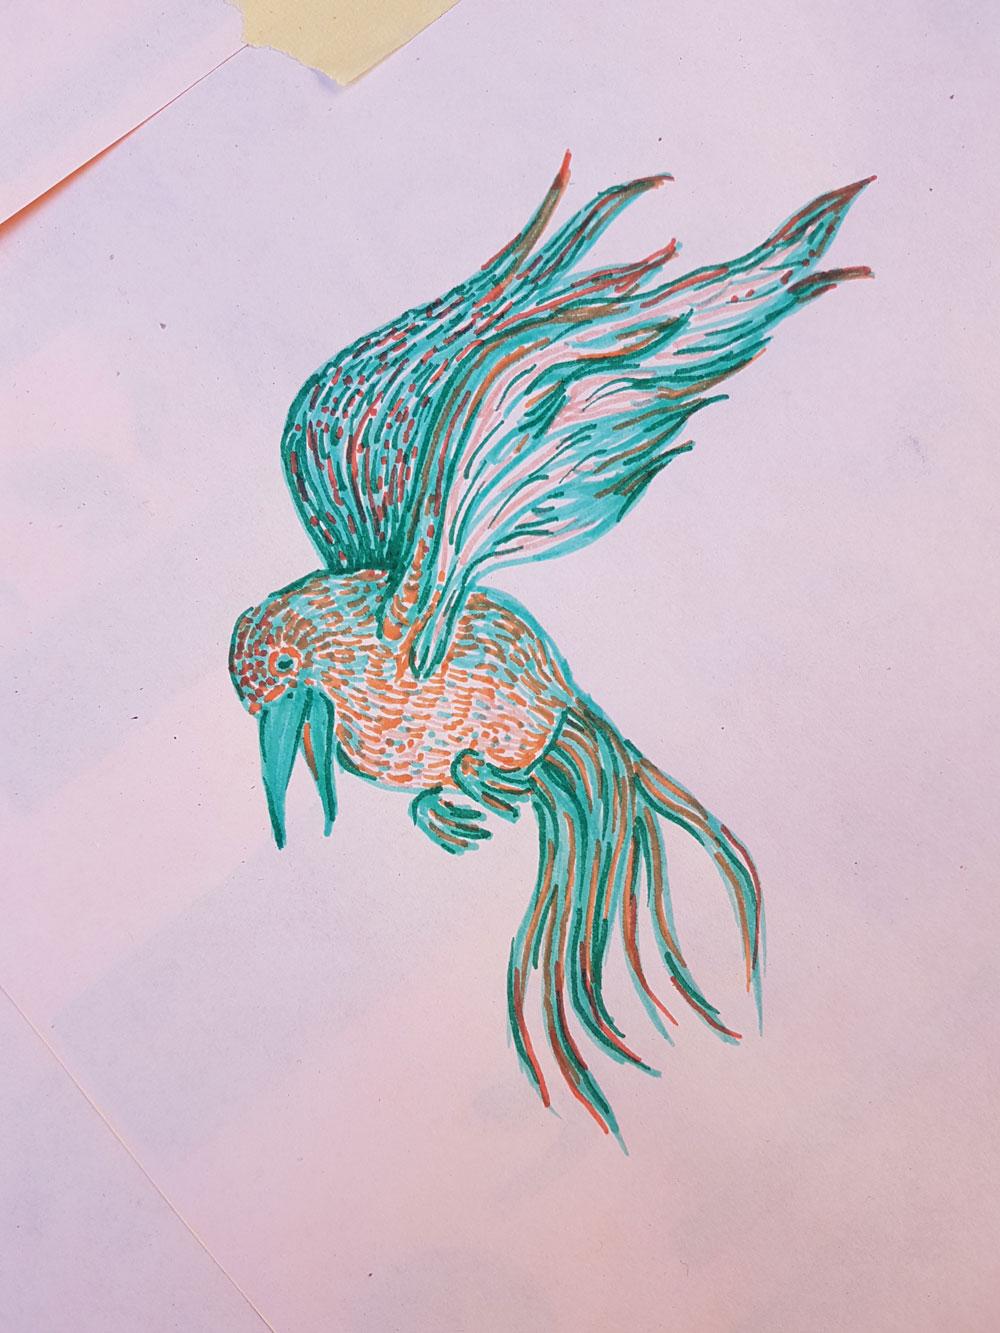 Marcelle-collectif-les-oiseaux-drink-n-draw_04.jpg